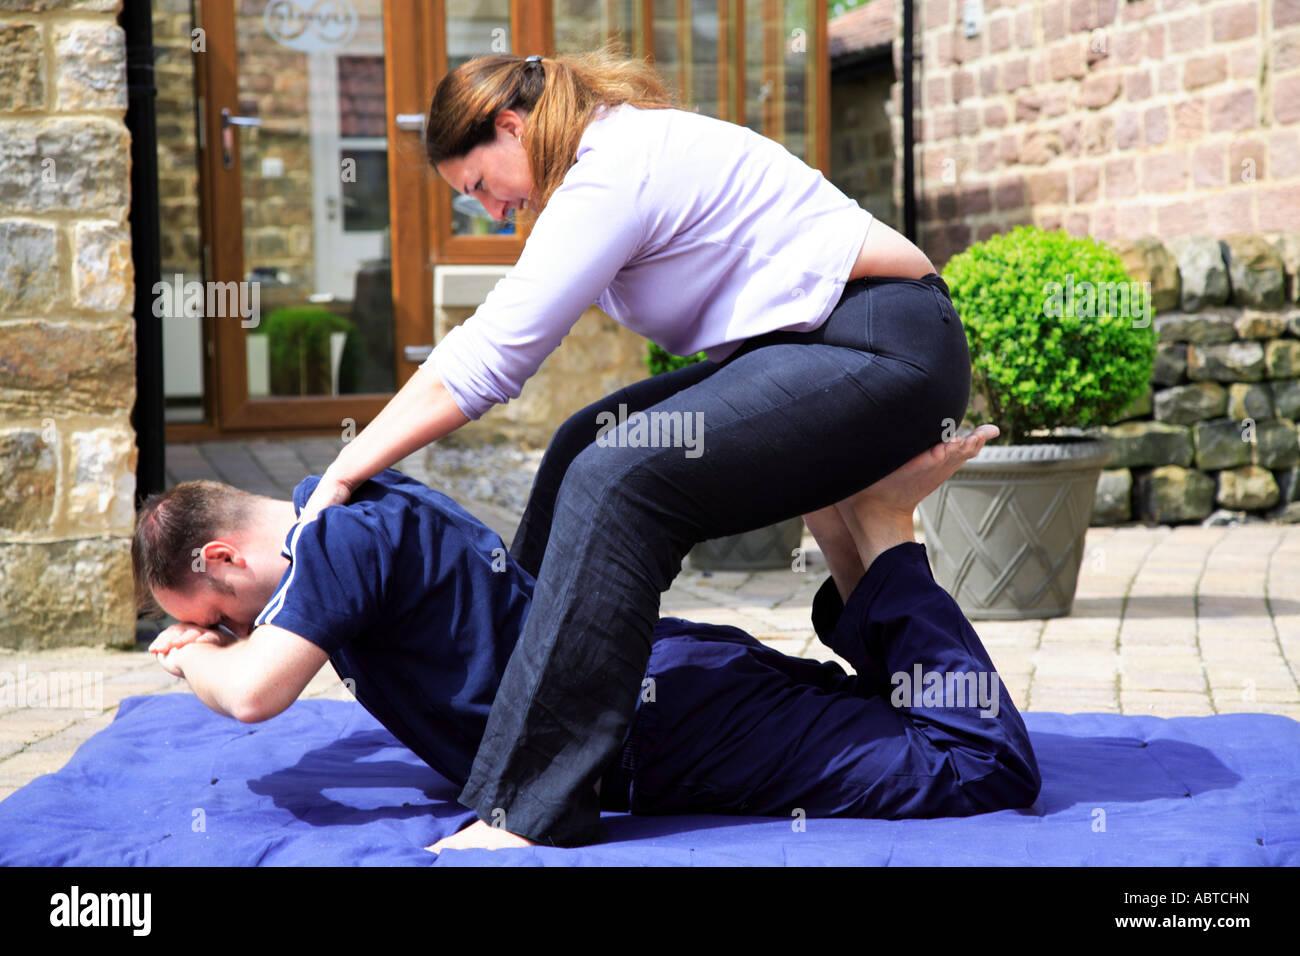 King Cobra se presentan como parte de un masaje corporal tailandés Imagen De Stock